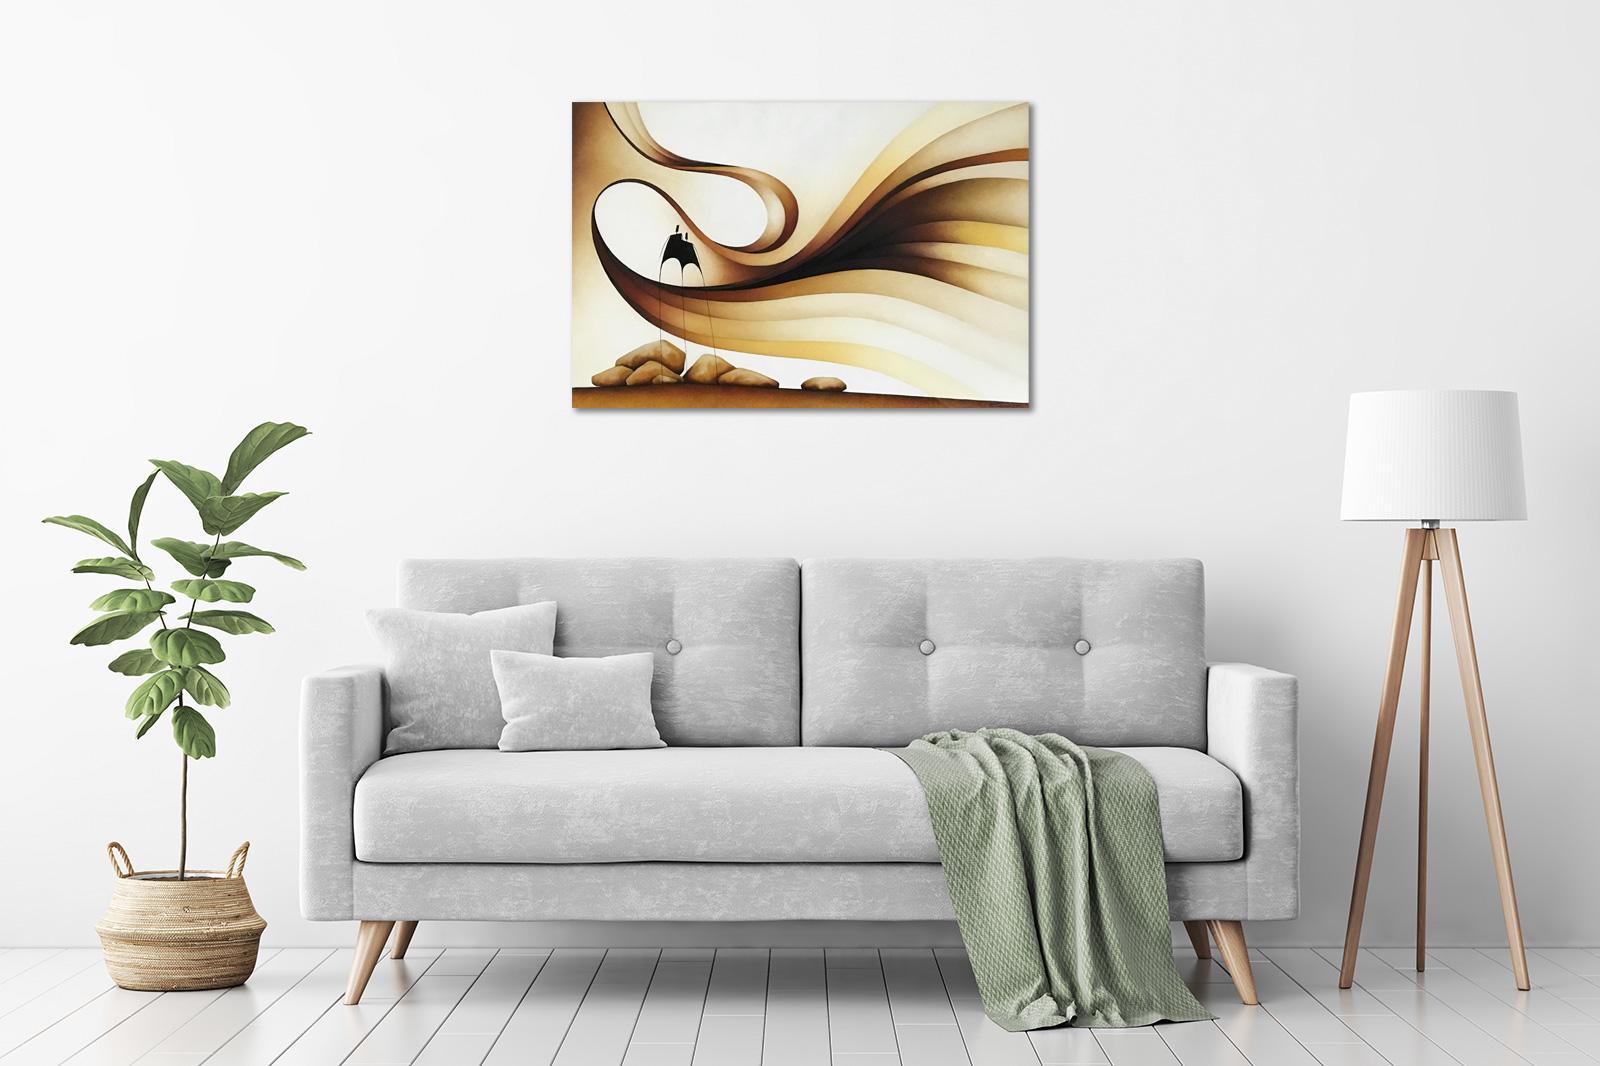 Stephen Gunner - 'Ochre Winds' in a room